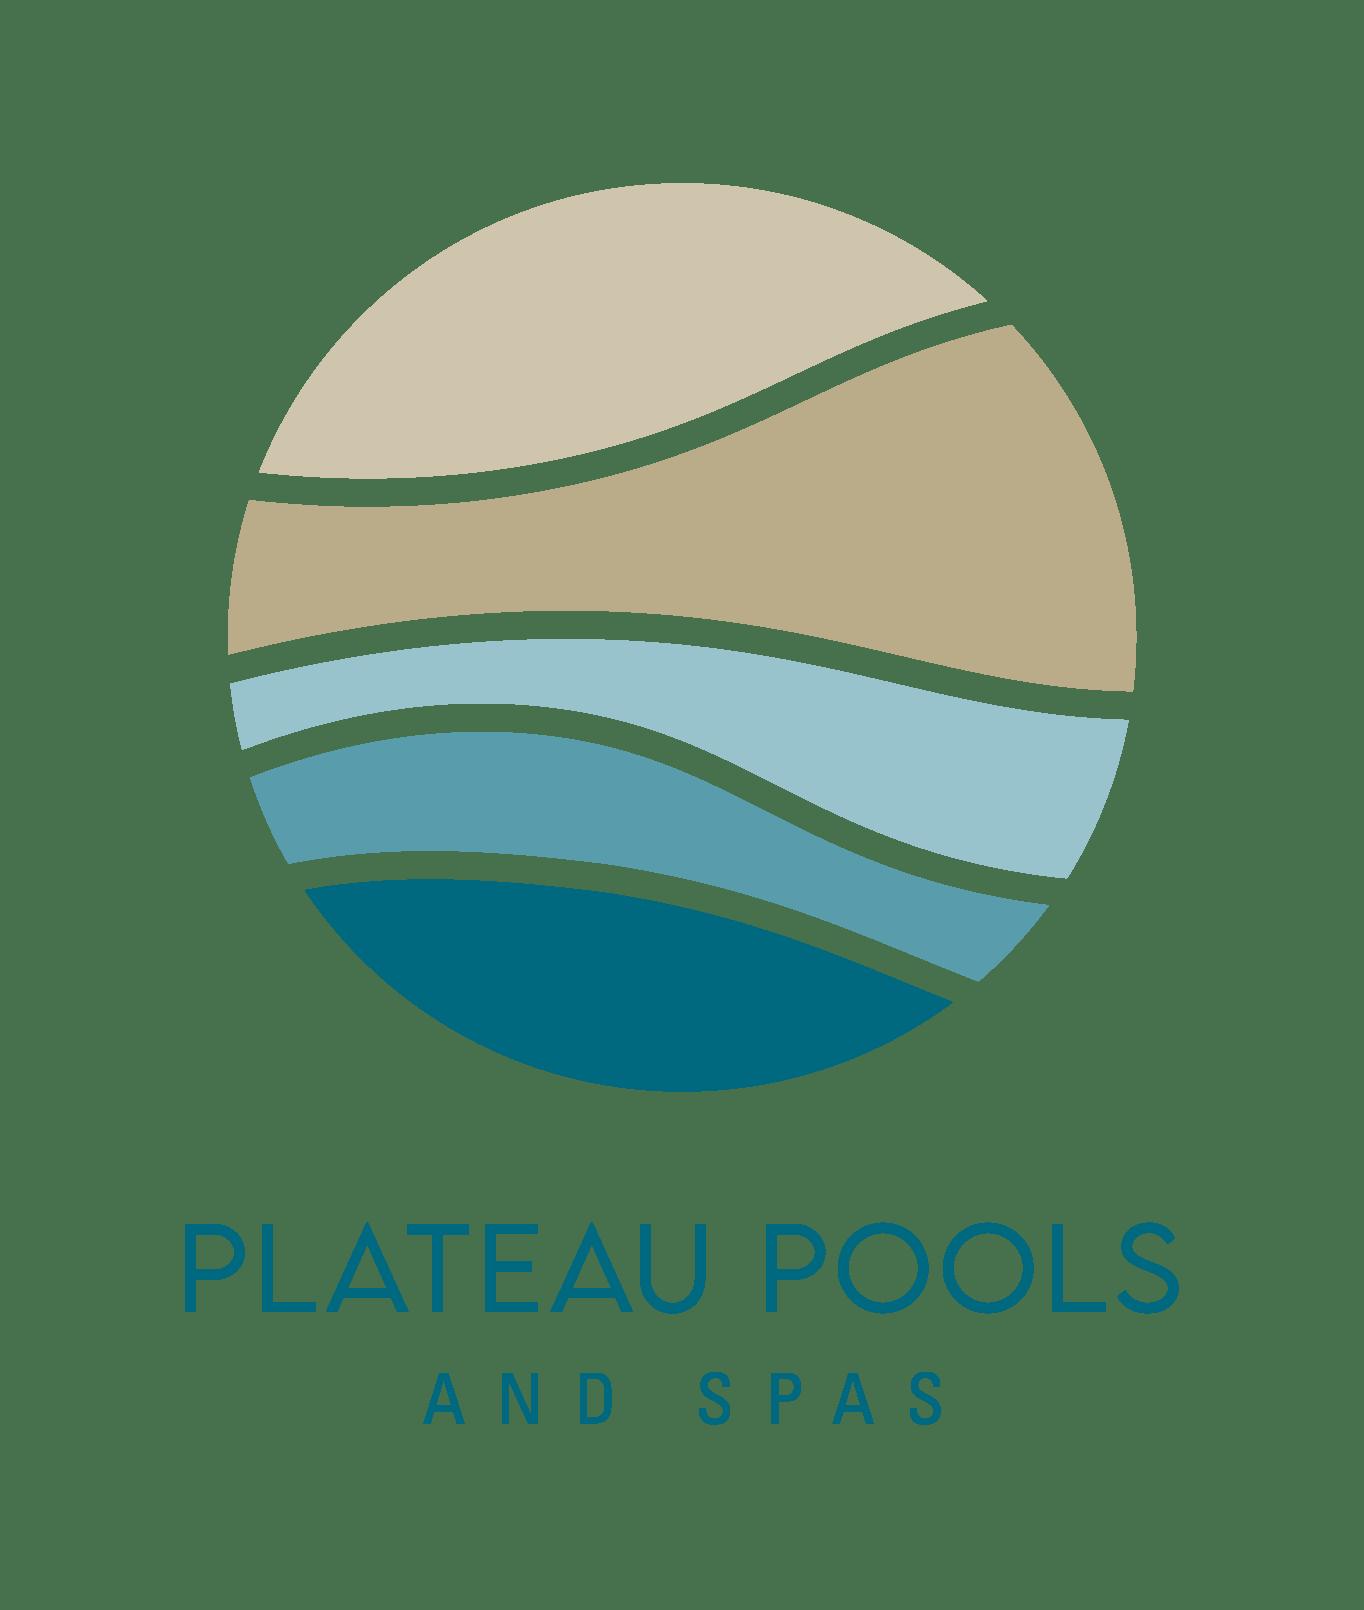 plateau pools